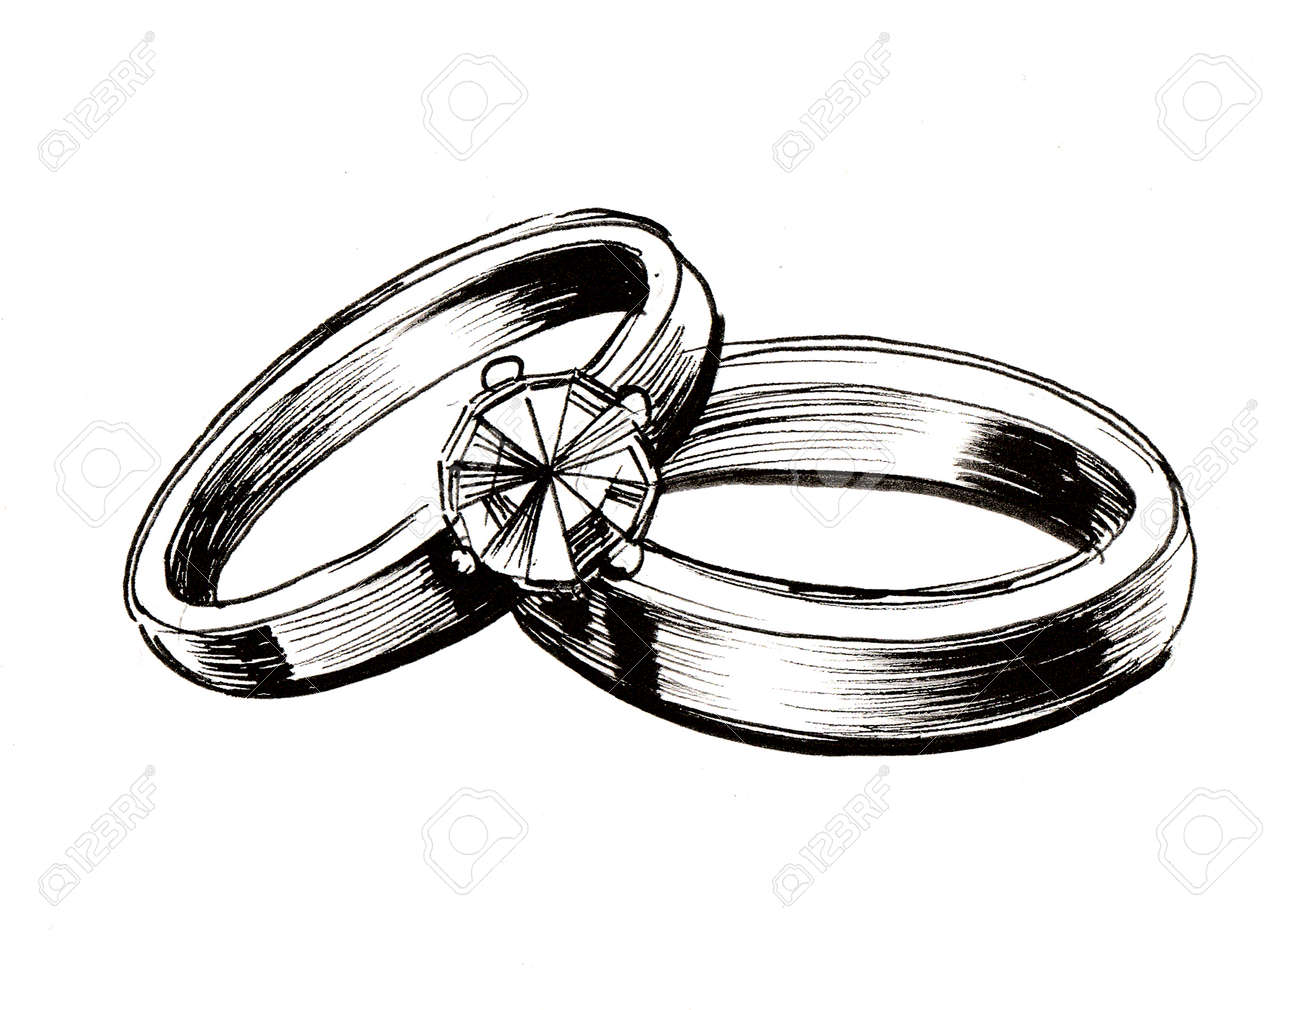 Wedding rings. Ink black and white illustration - 104414351